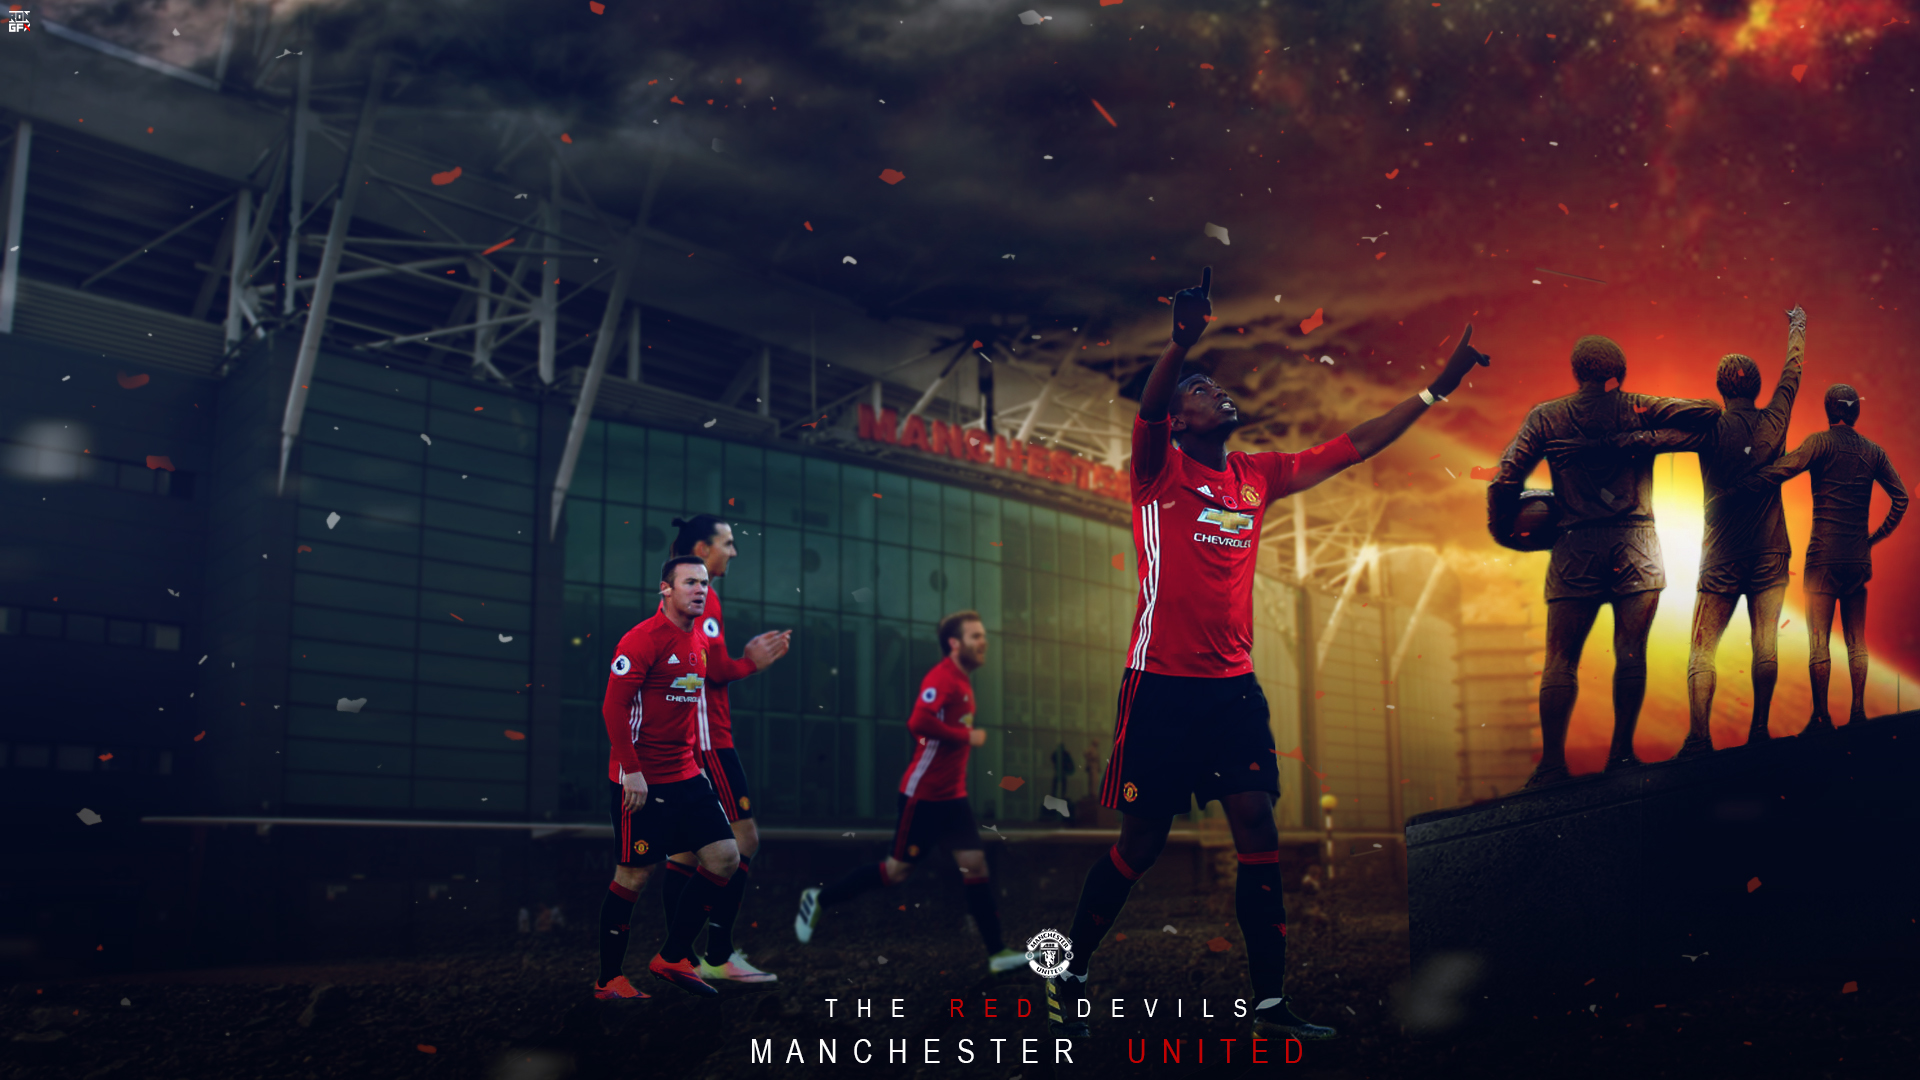 Manchester United Desktop Wallpaper By Ropn1996 On Deviantart